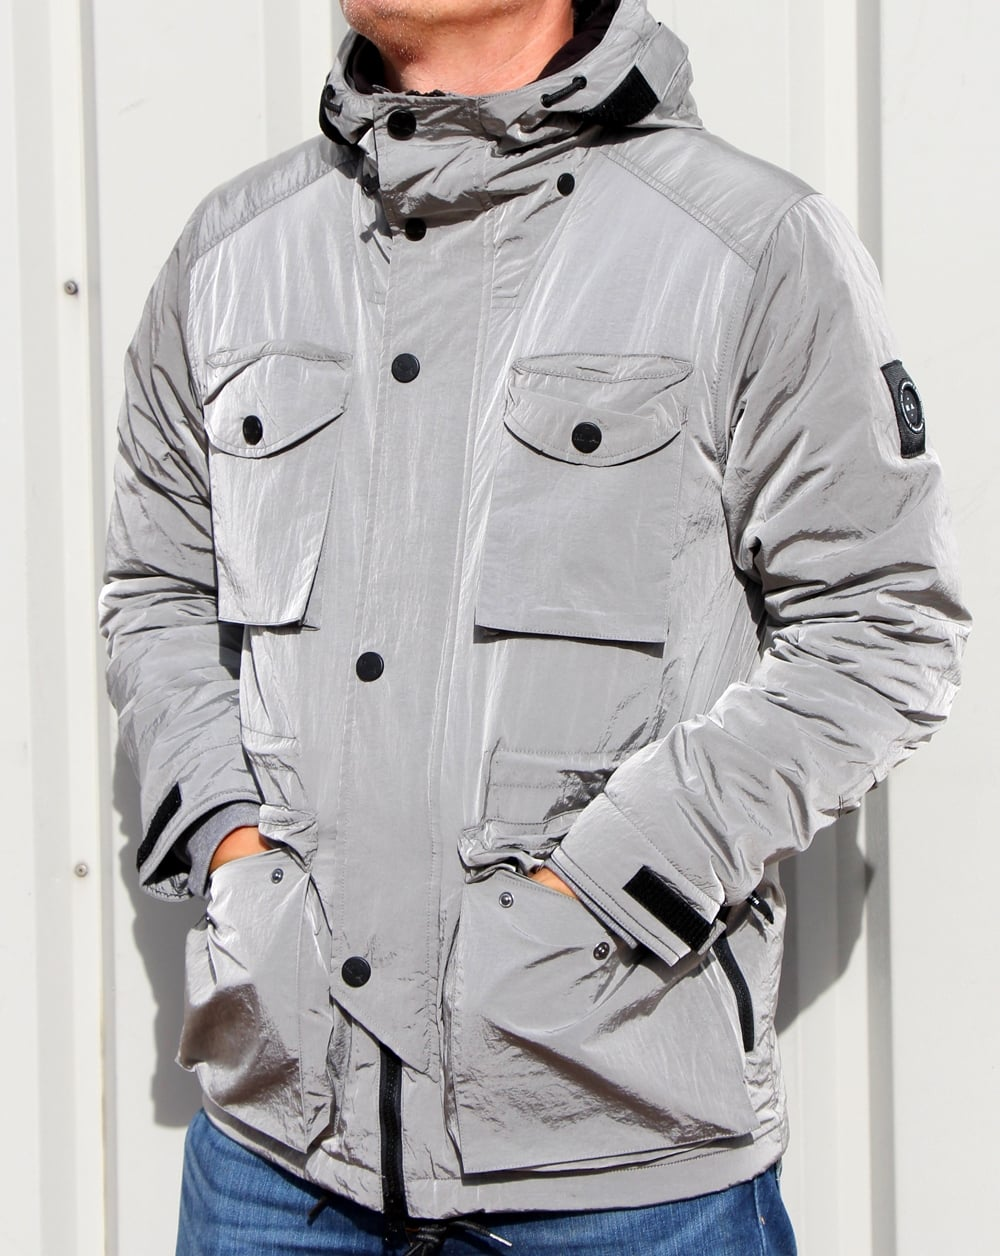 Marshall Artist Liquid Nylon Snow Parka Silver Jacket Coat